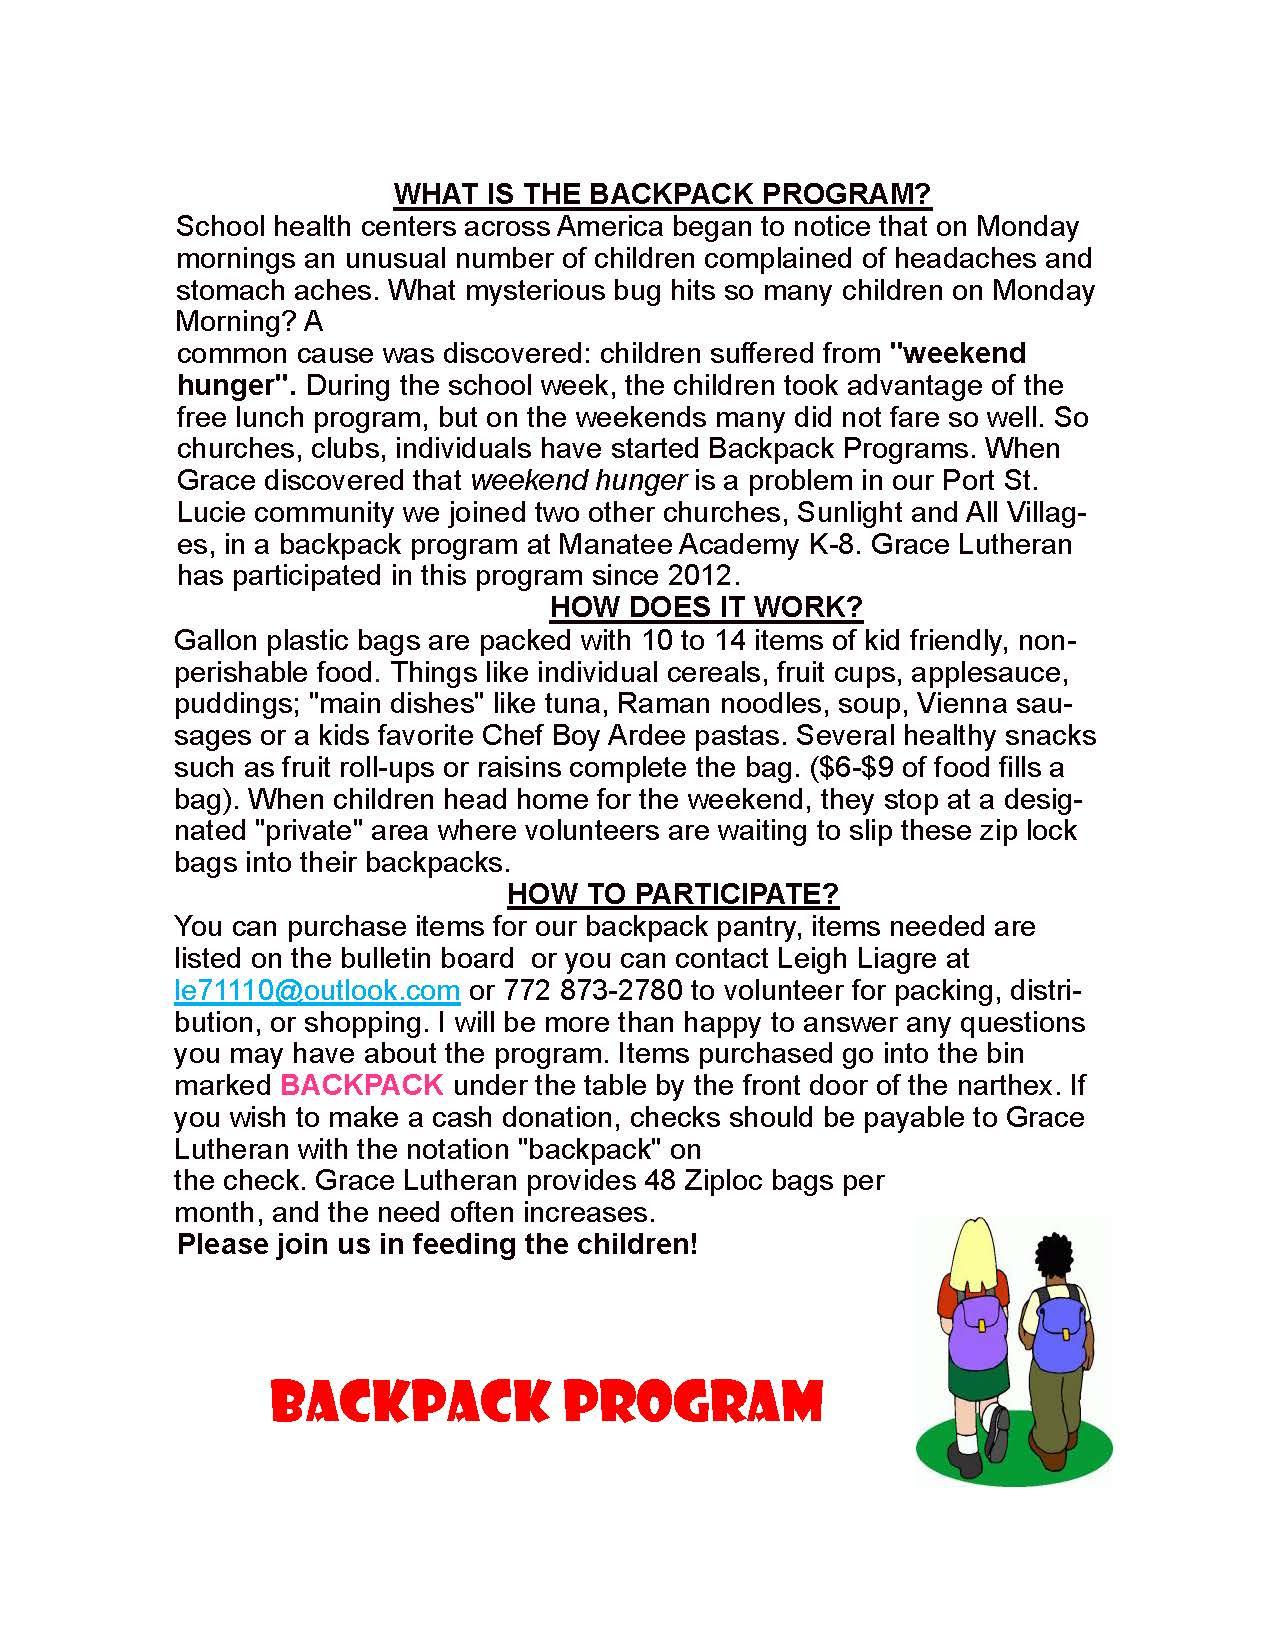 Grace News JAN 2018 pub (1)_Page_05.jpg